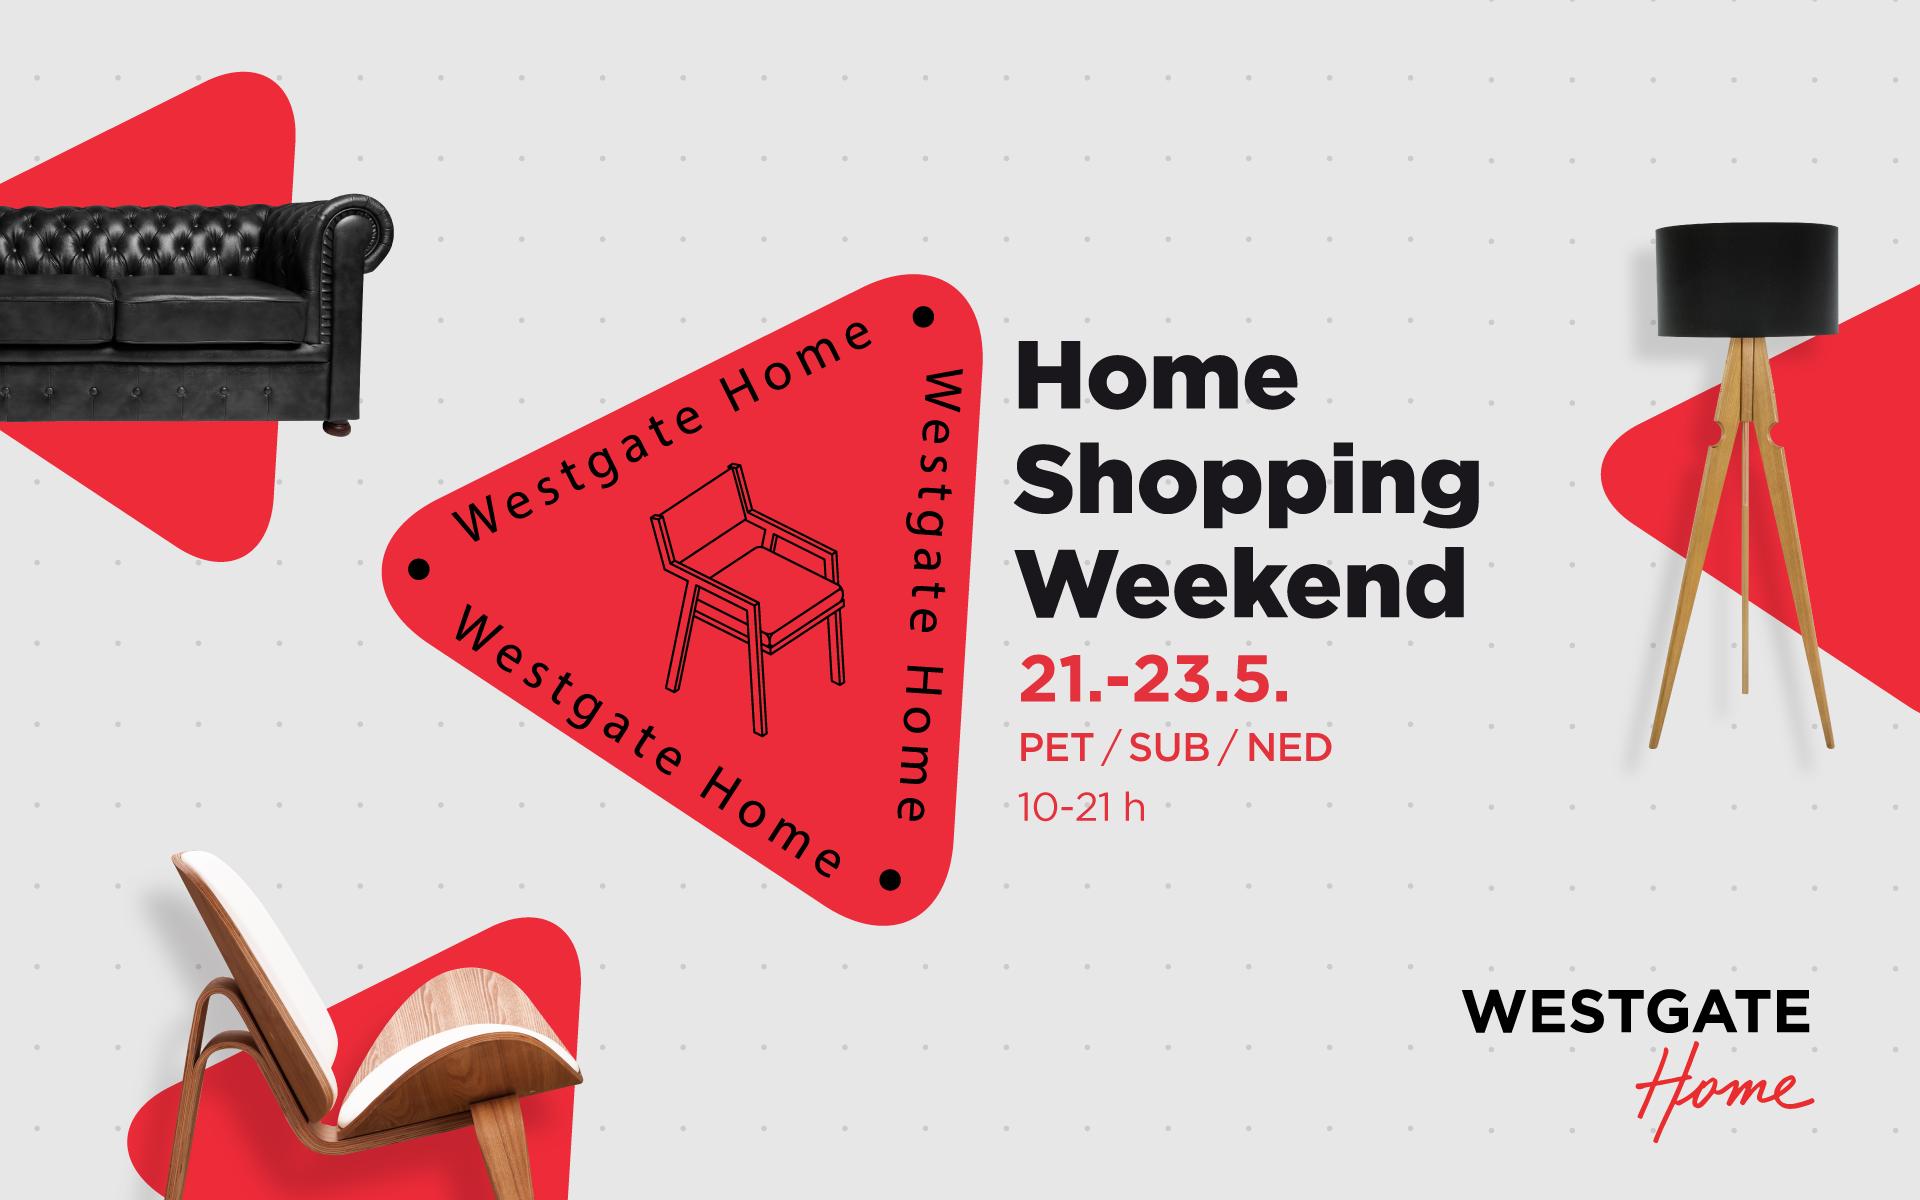 Home Shopping Weekend